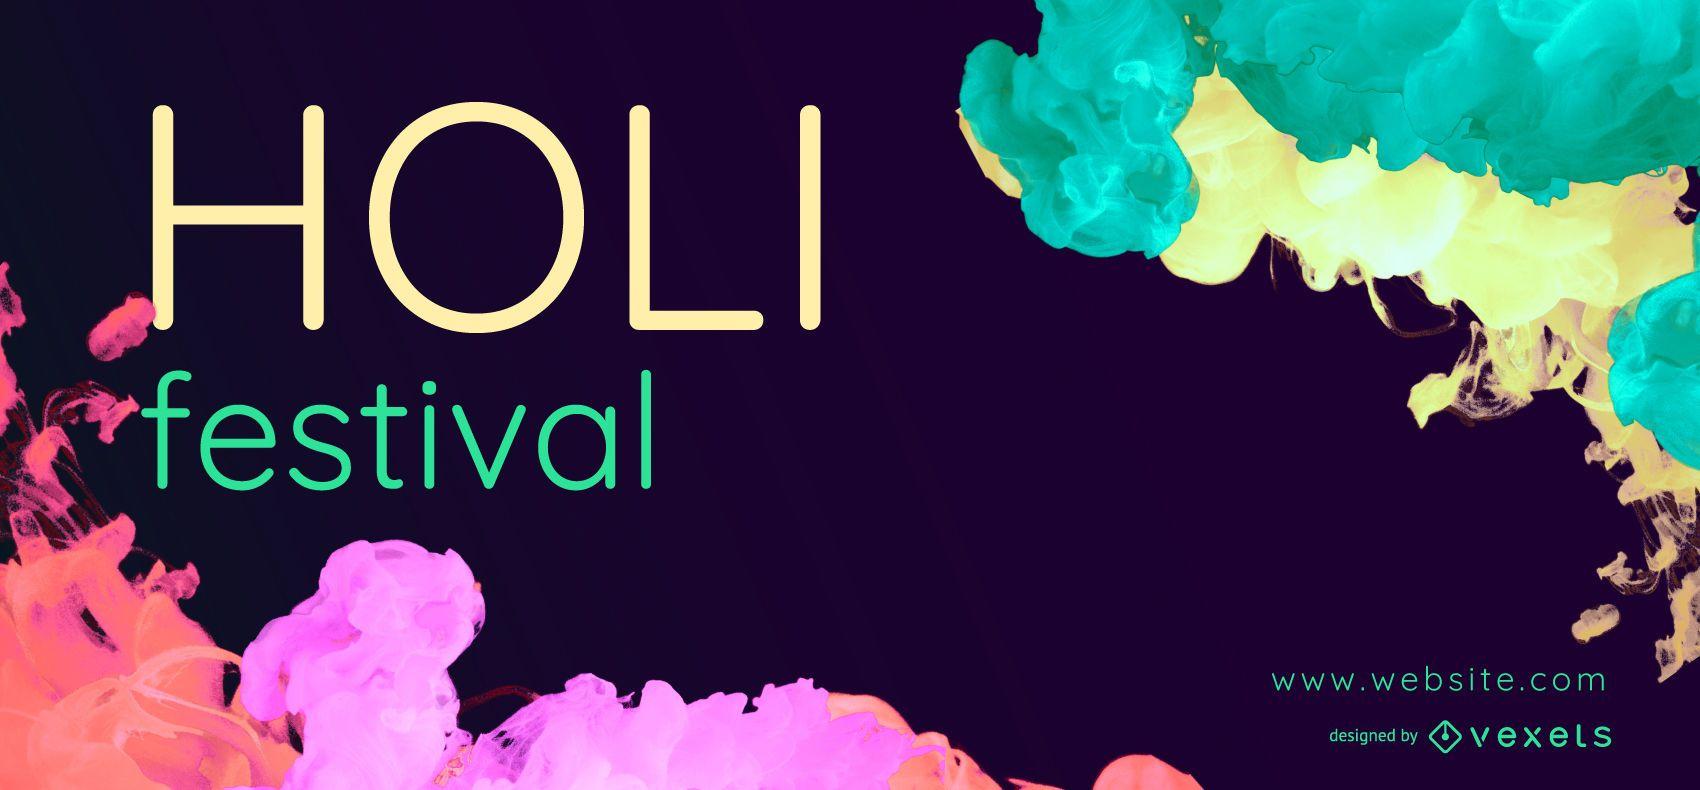 Diseño de banner web Holi Festival